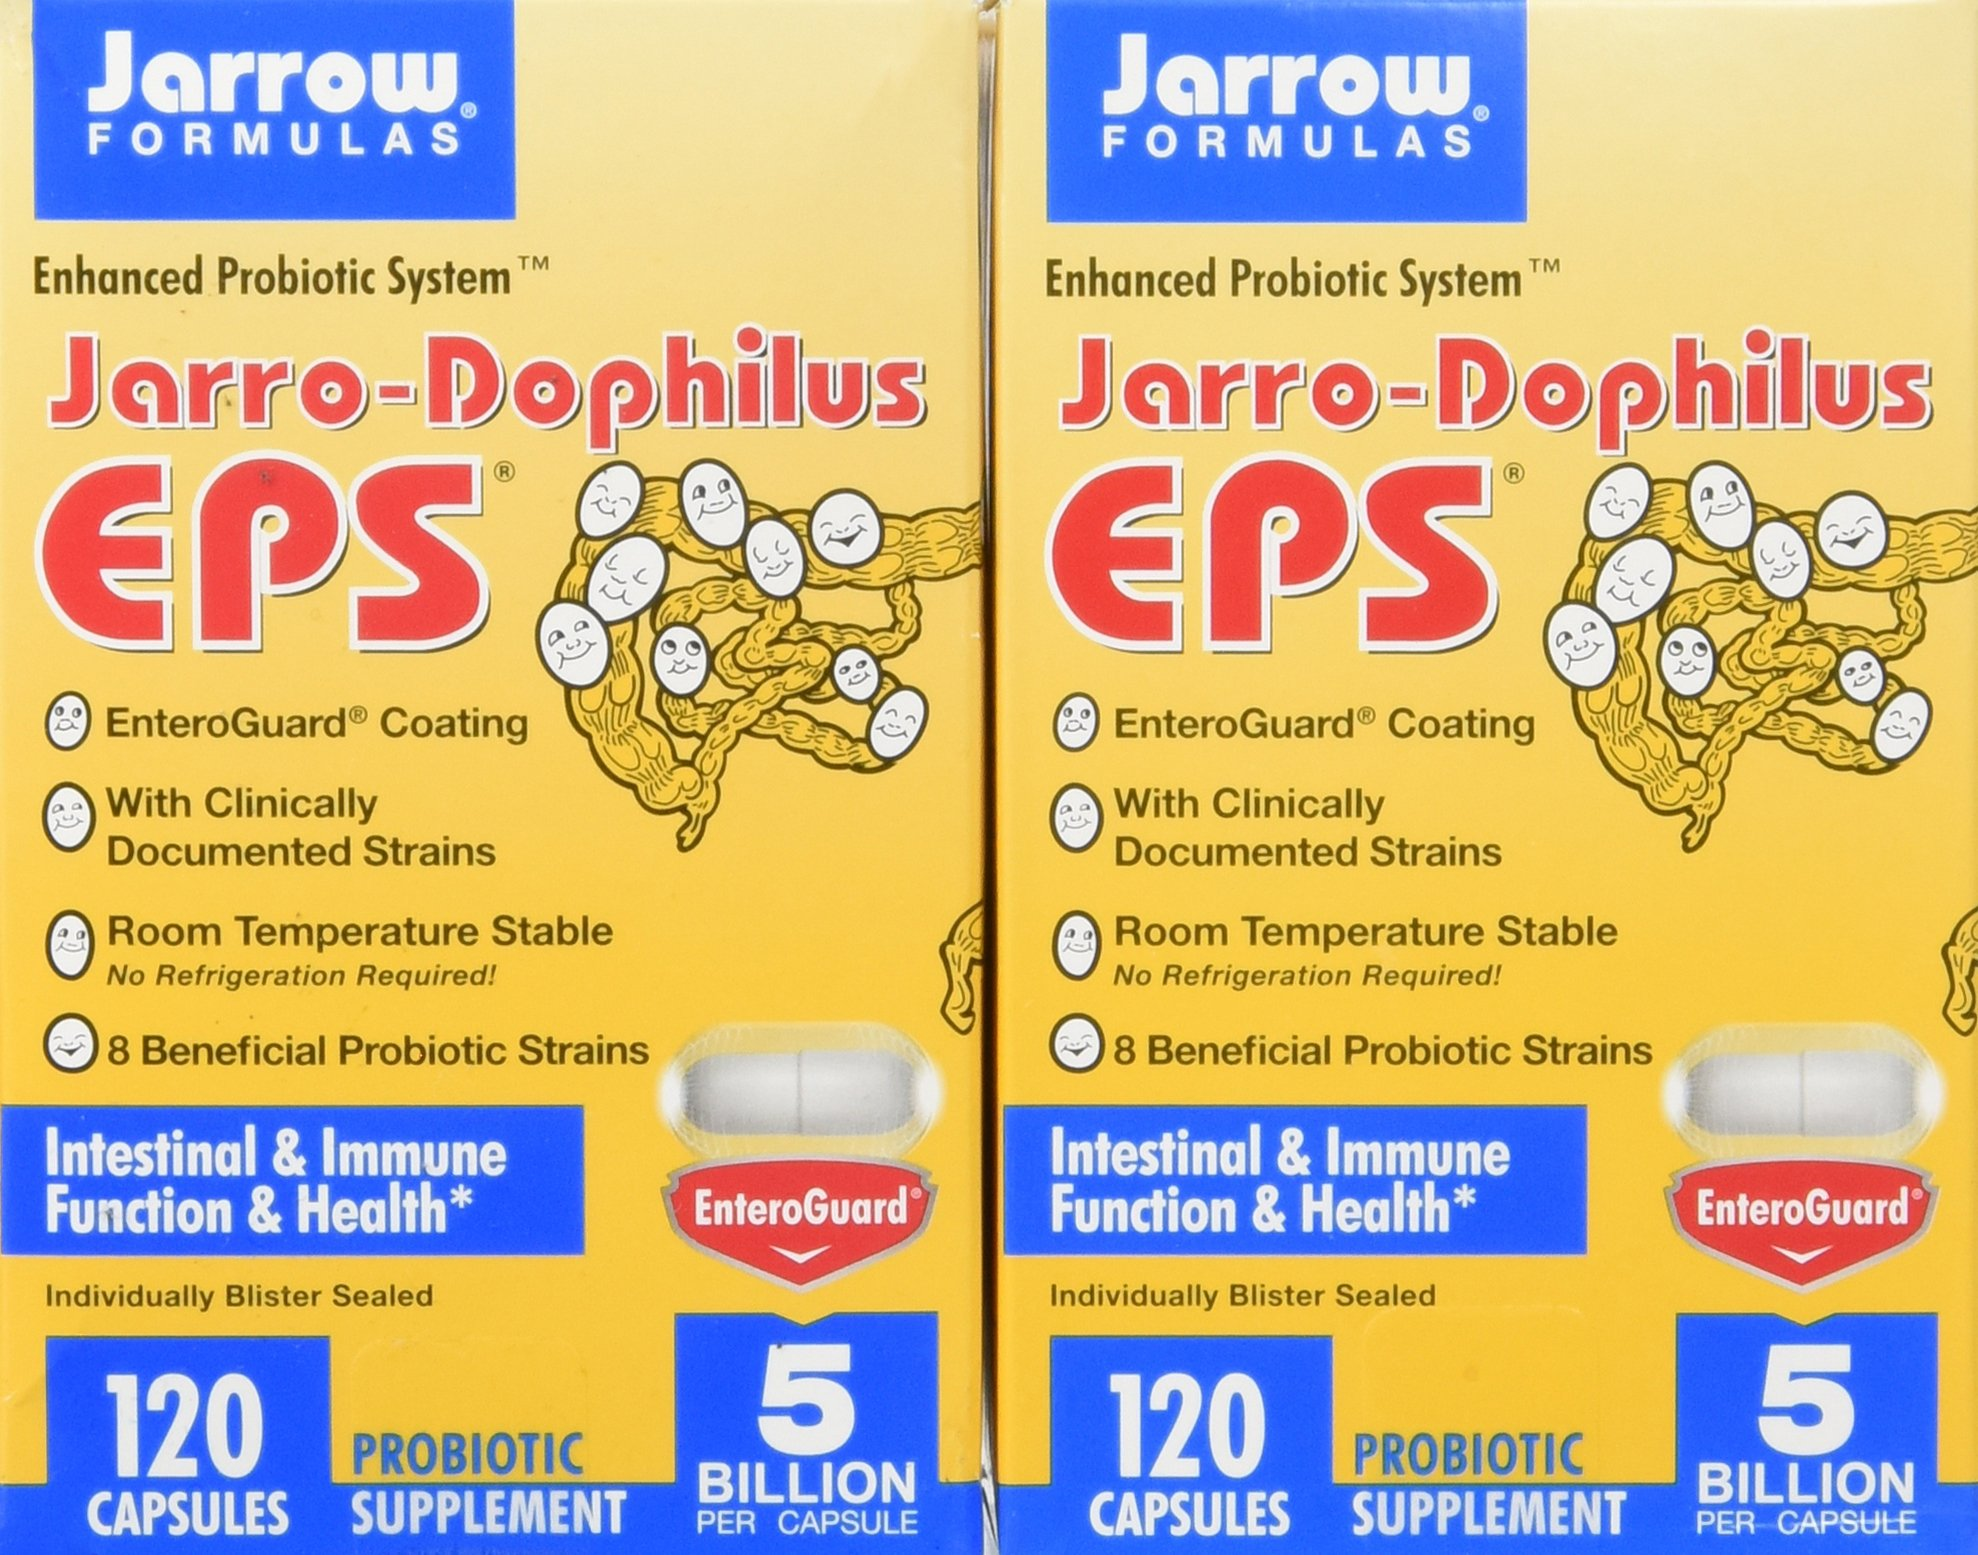 Jarrow Formulas Jarro-dophilus + Eps  (2 PACK) 240 capsules